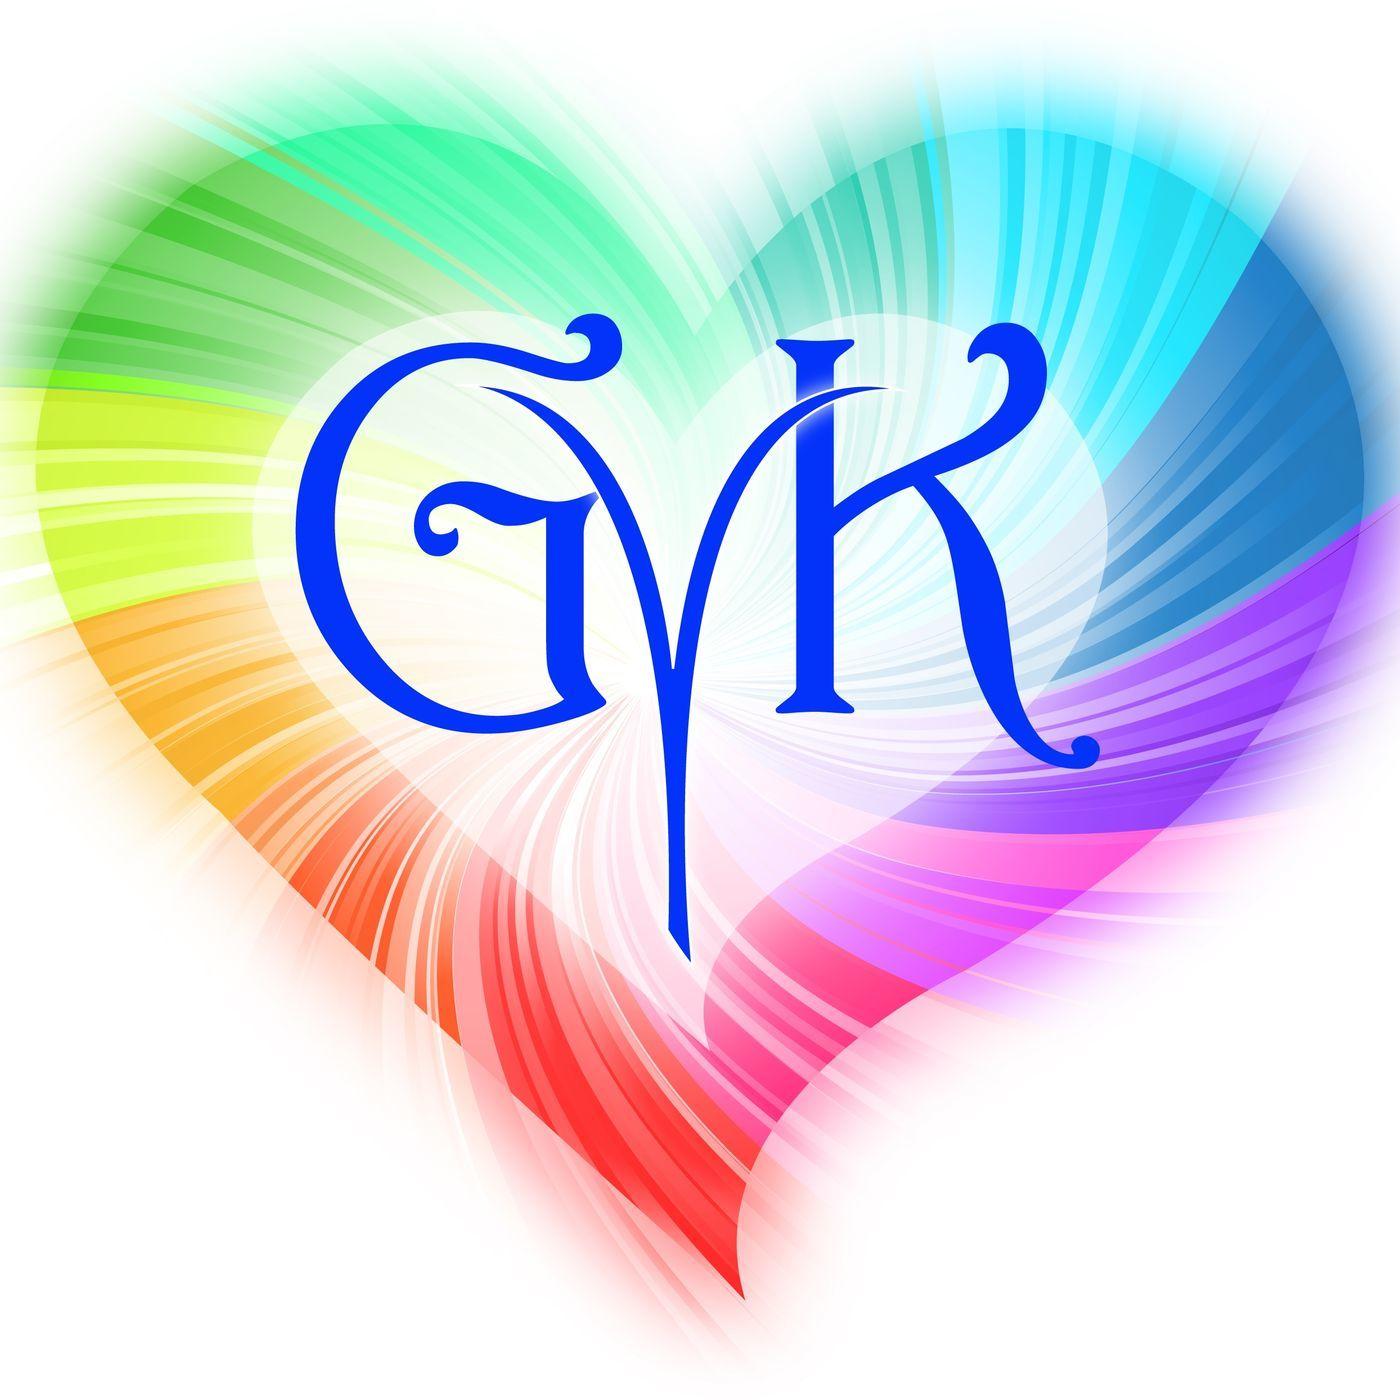 GVK: Kristin chats with Carolyn Riker